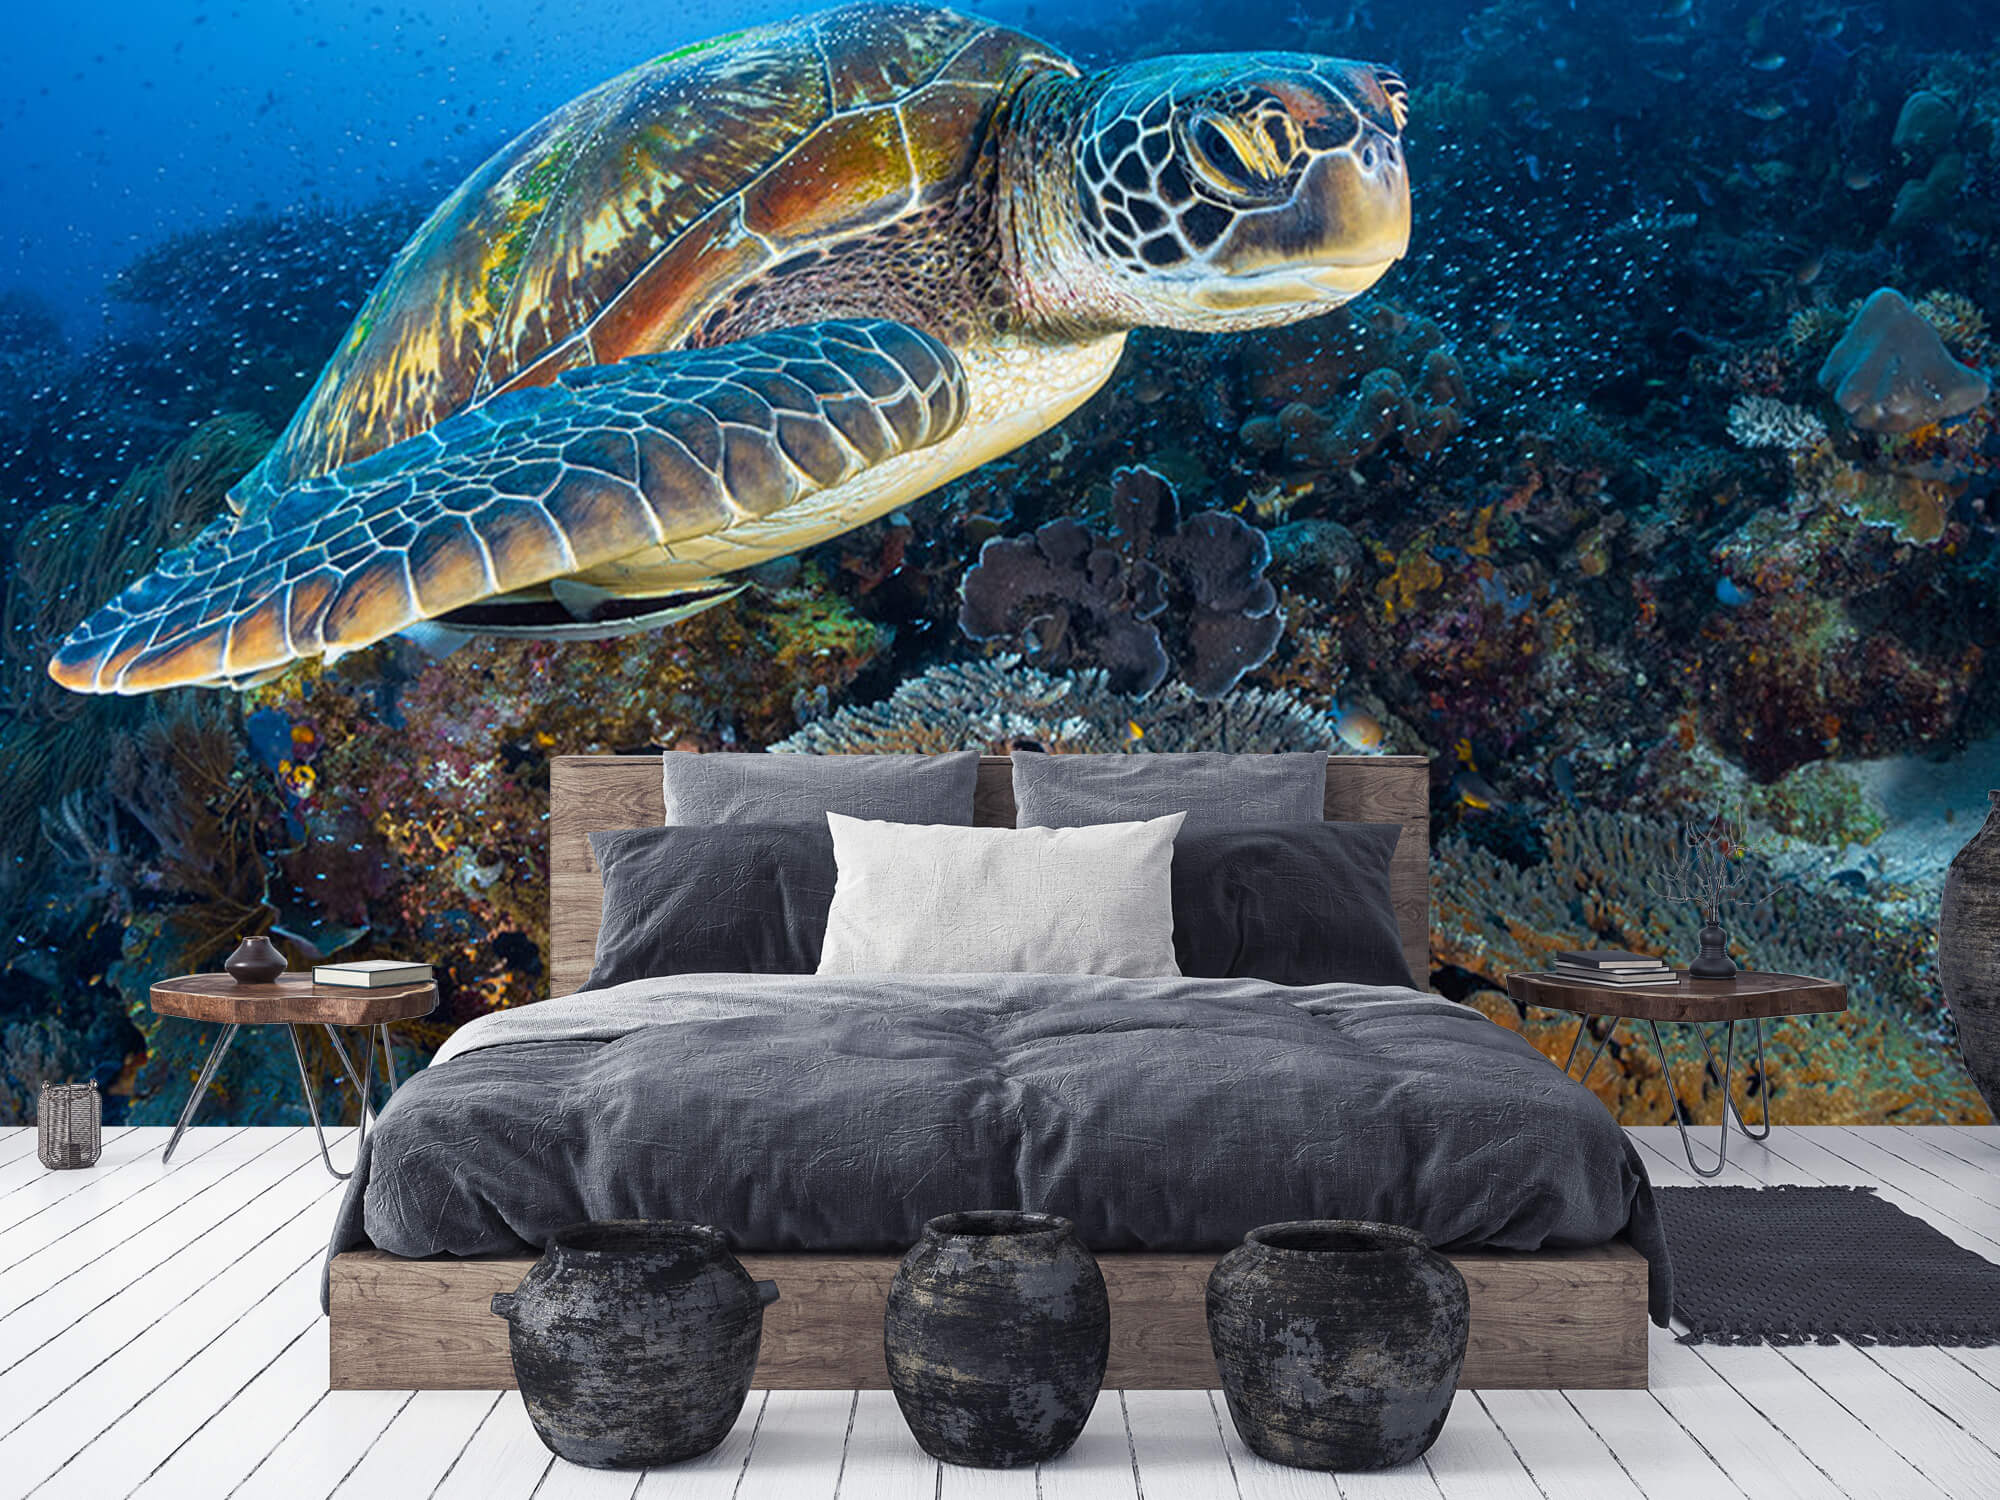 Green sea turtle from Raja Ampat 8